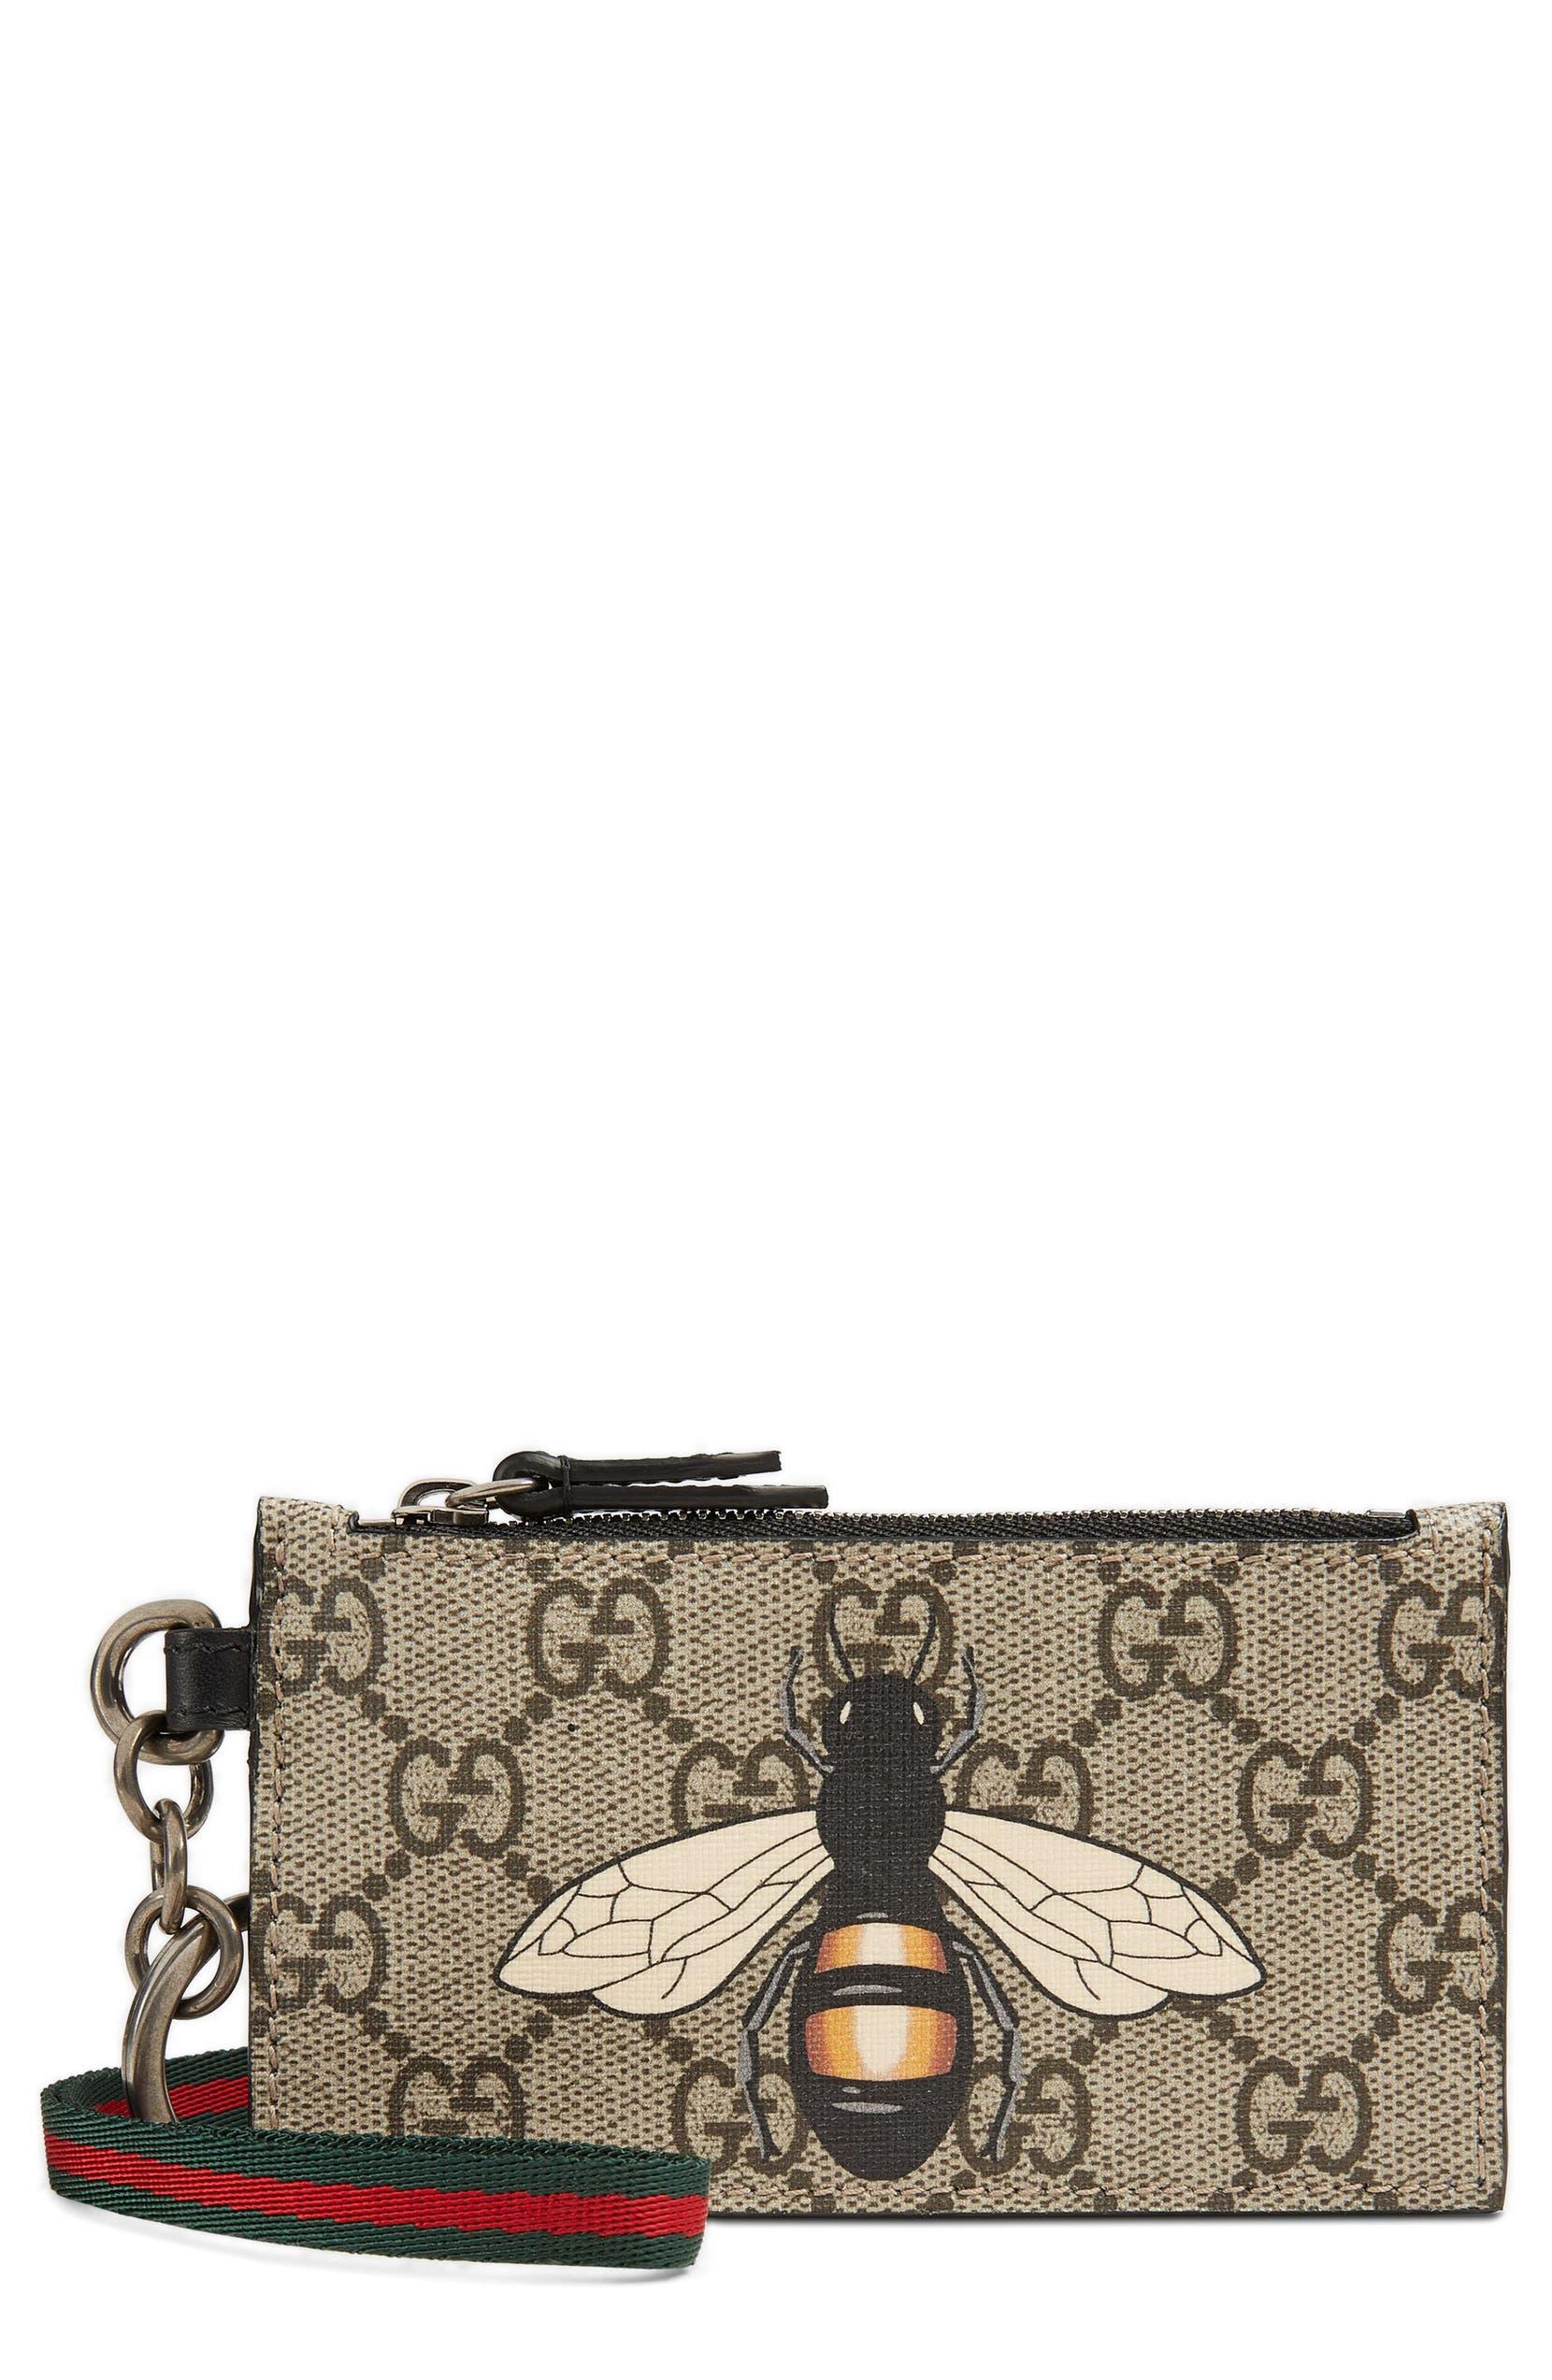 b0771900a270b5 Gucci GG Supreme Bee Print Lanyard Card Case | Nordstrom